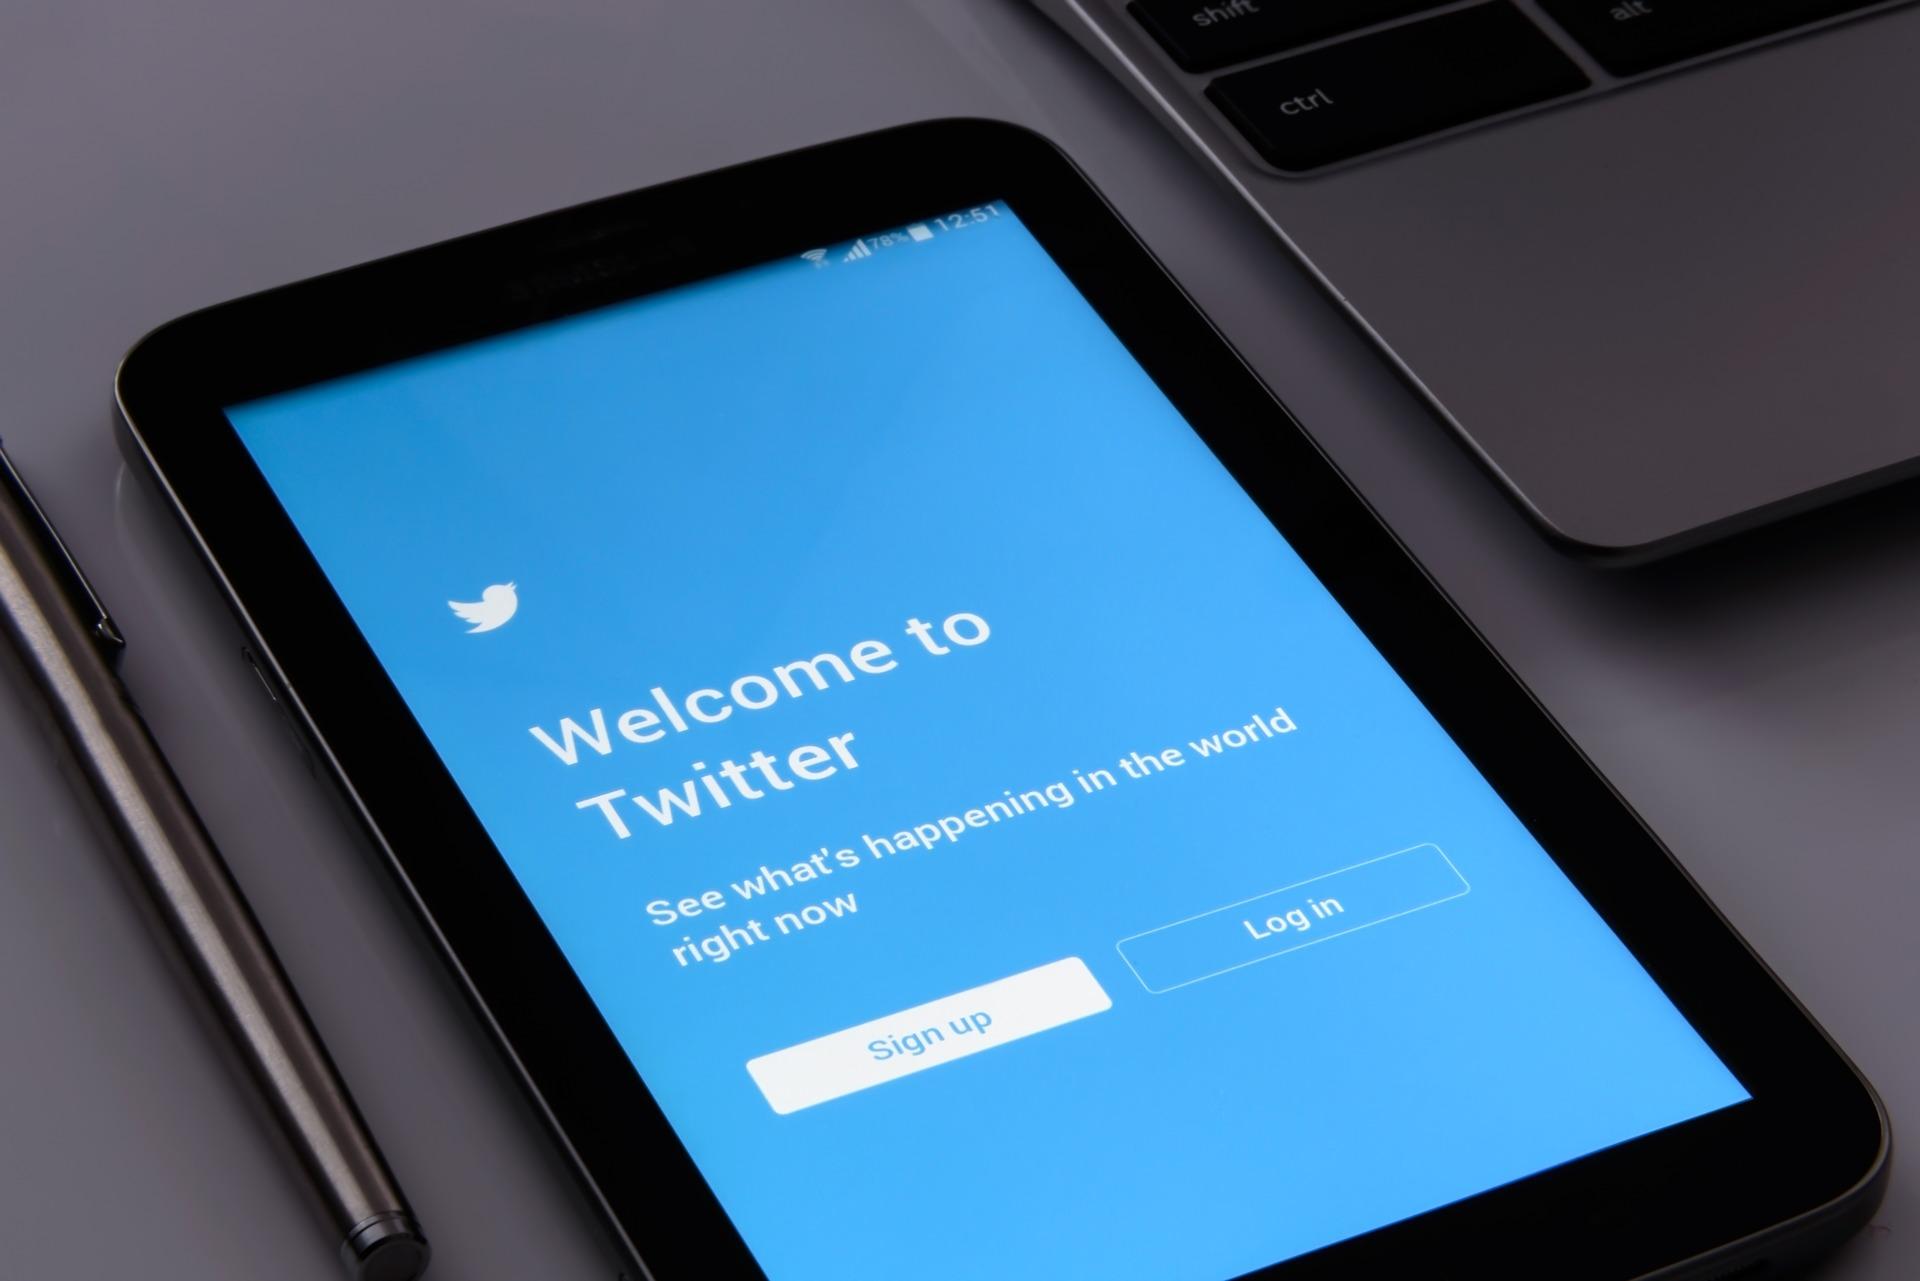 autoketing-sell-twitter-get-followers-part-3-3